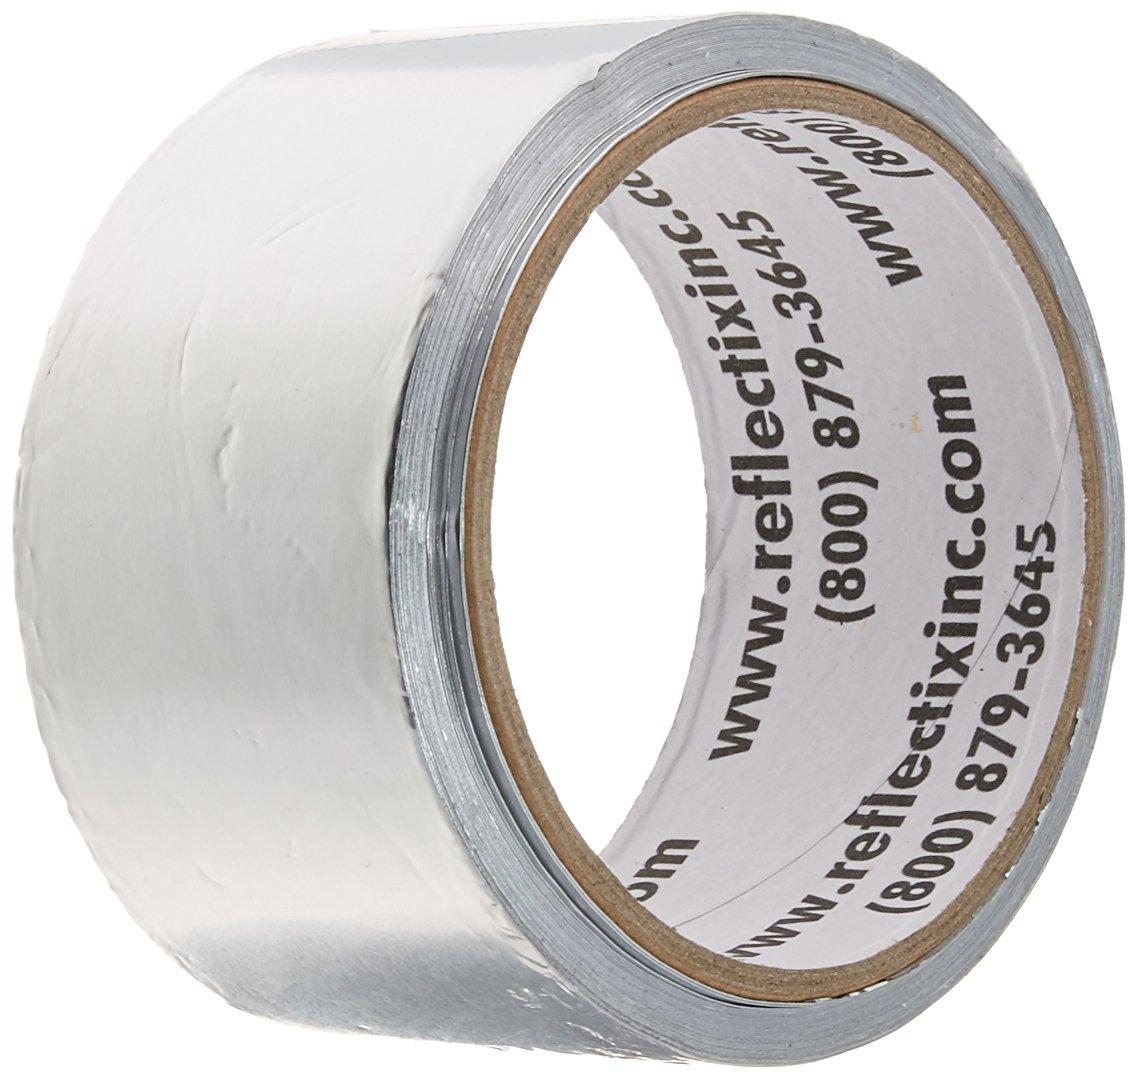 "Reflectix FT210 Reflective Foil Tape, 2"" x 30'"